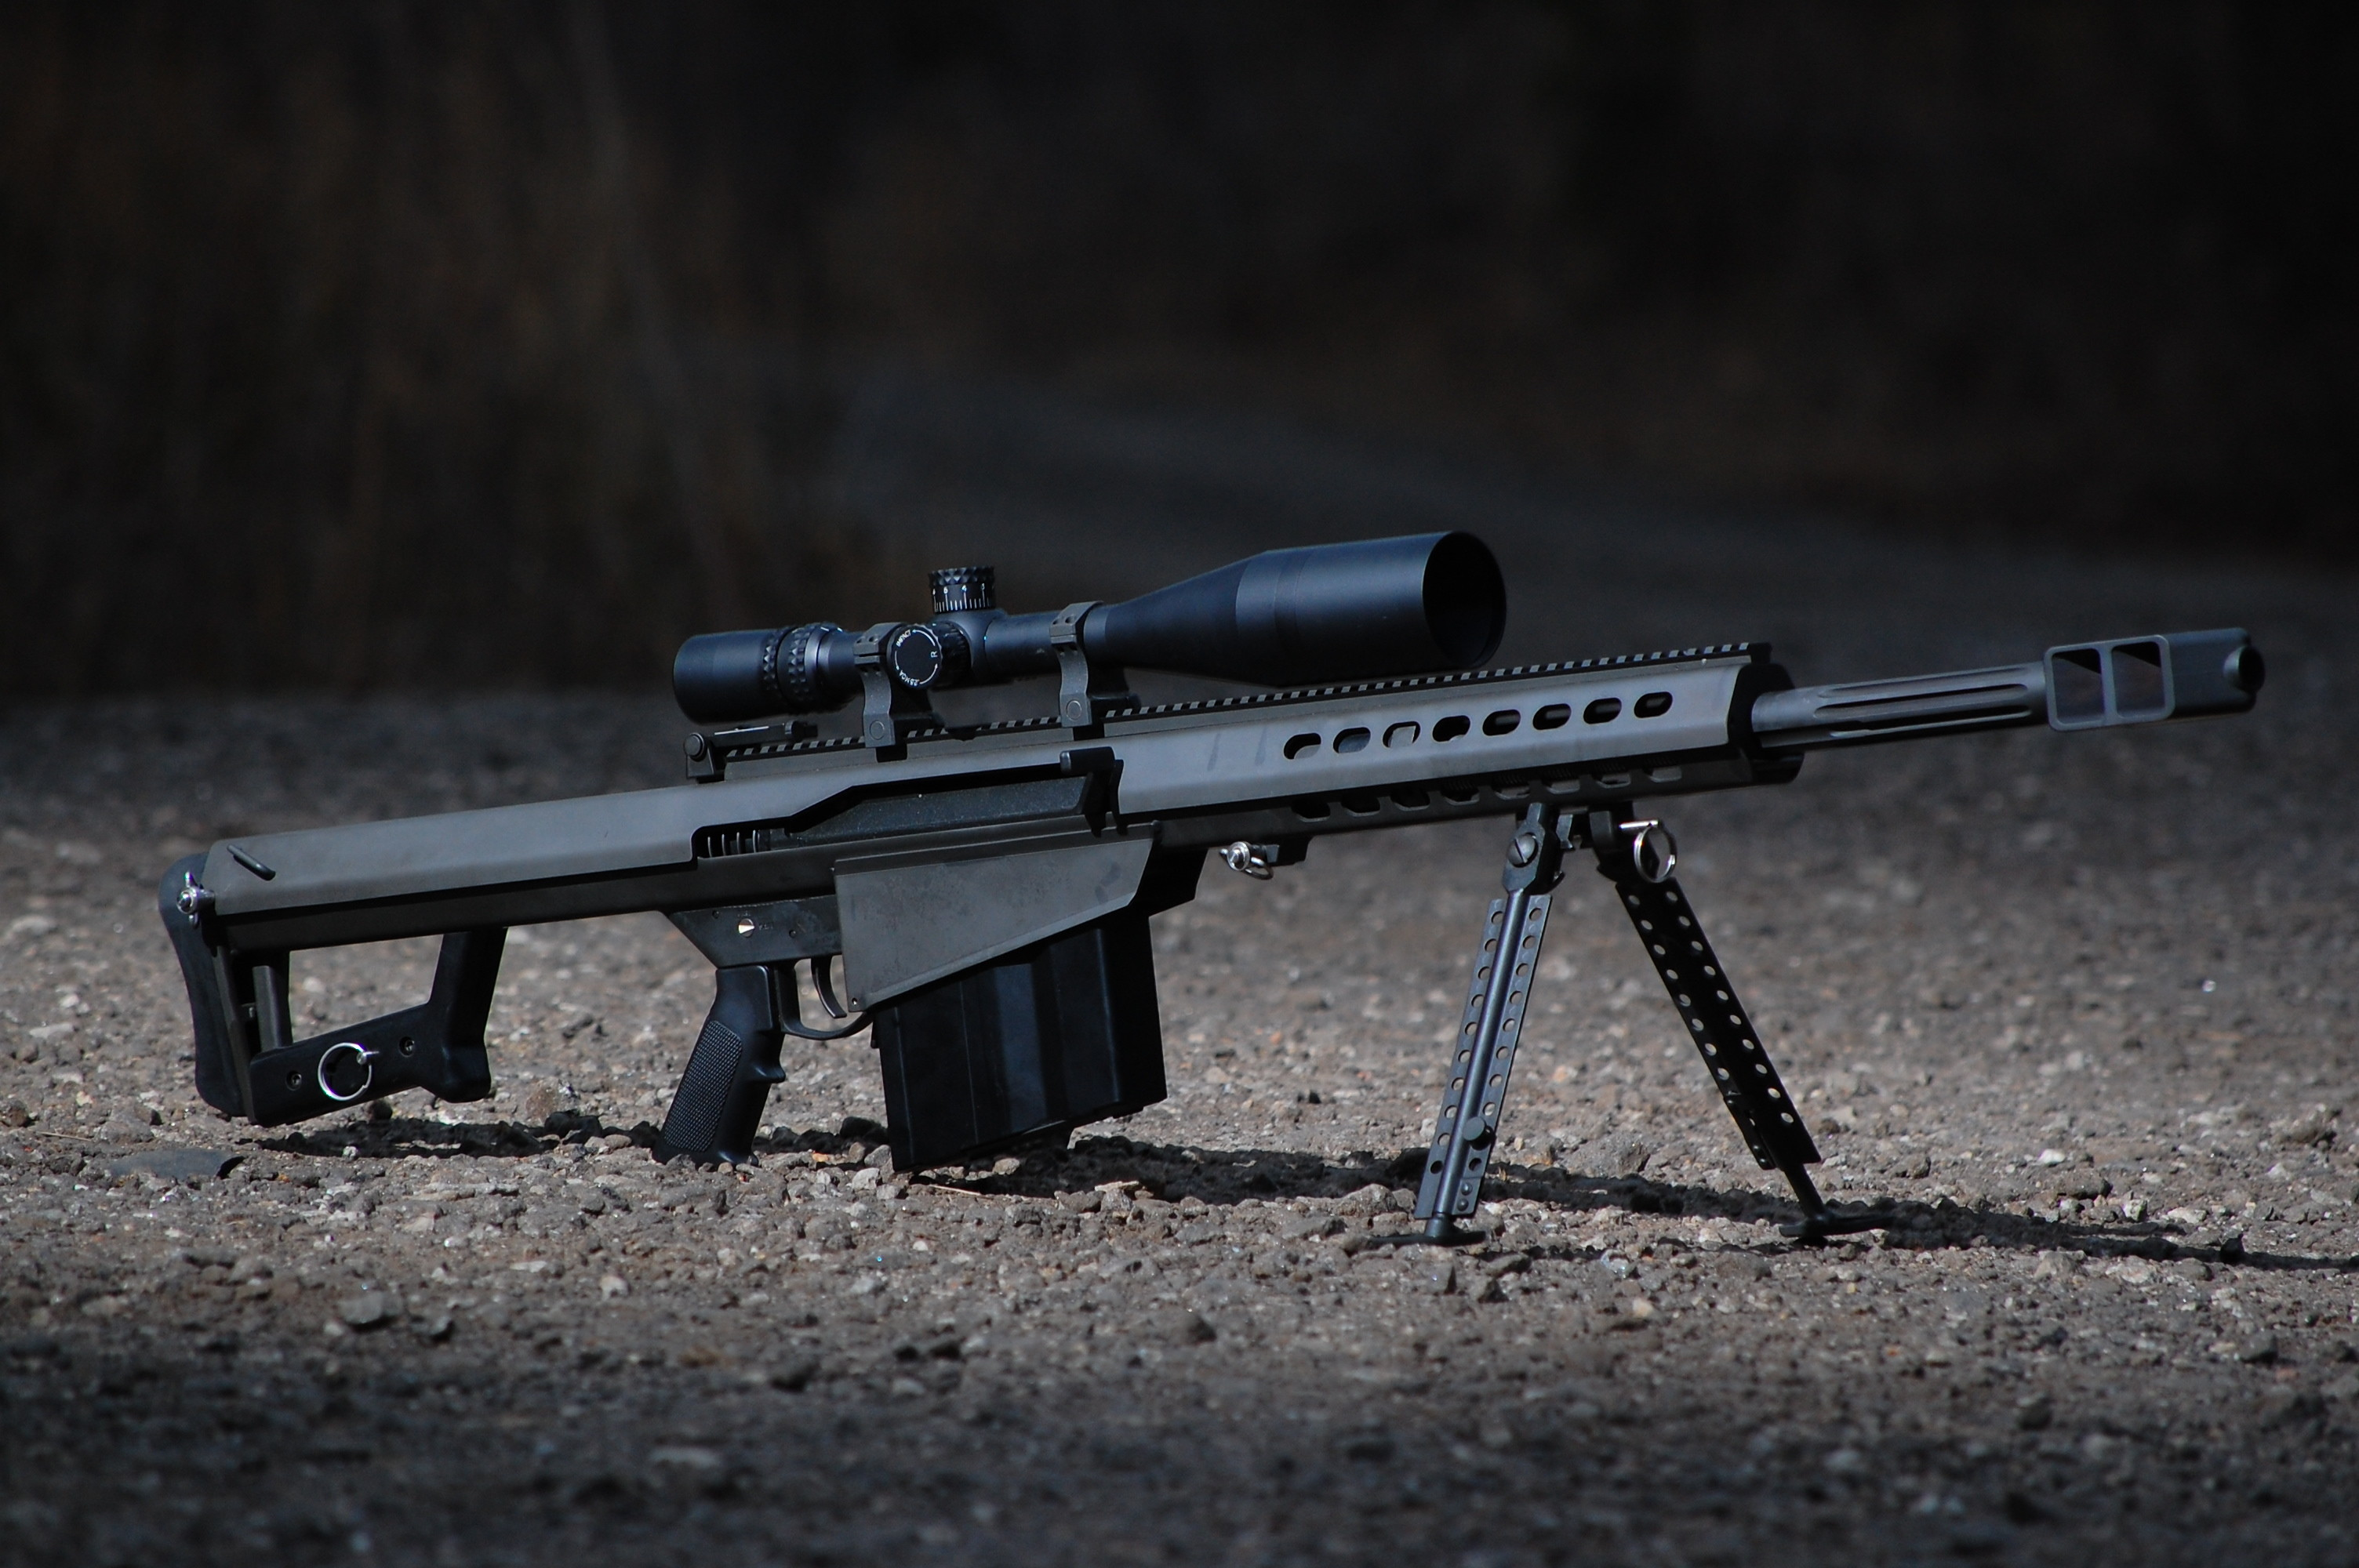 Sniper Rifle Wallpaper 73 images 3008x2000